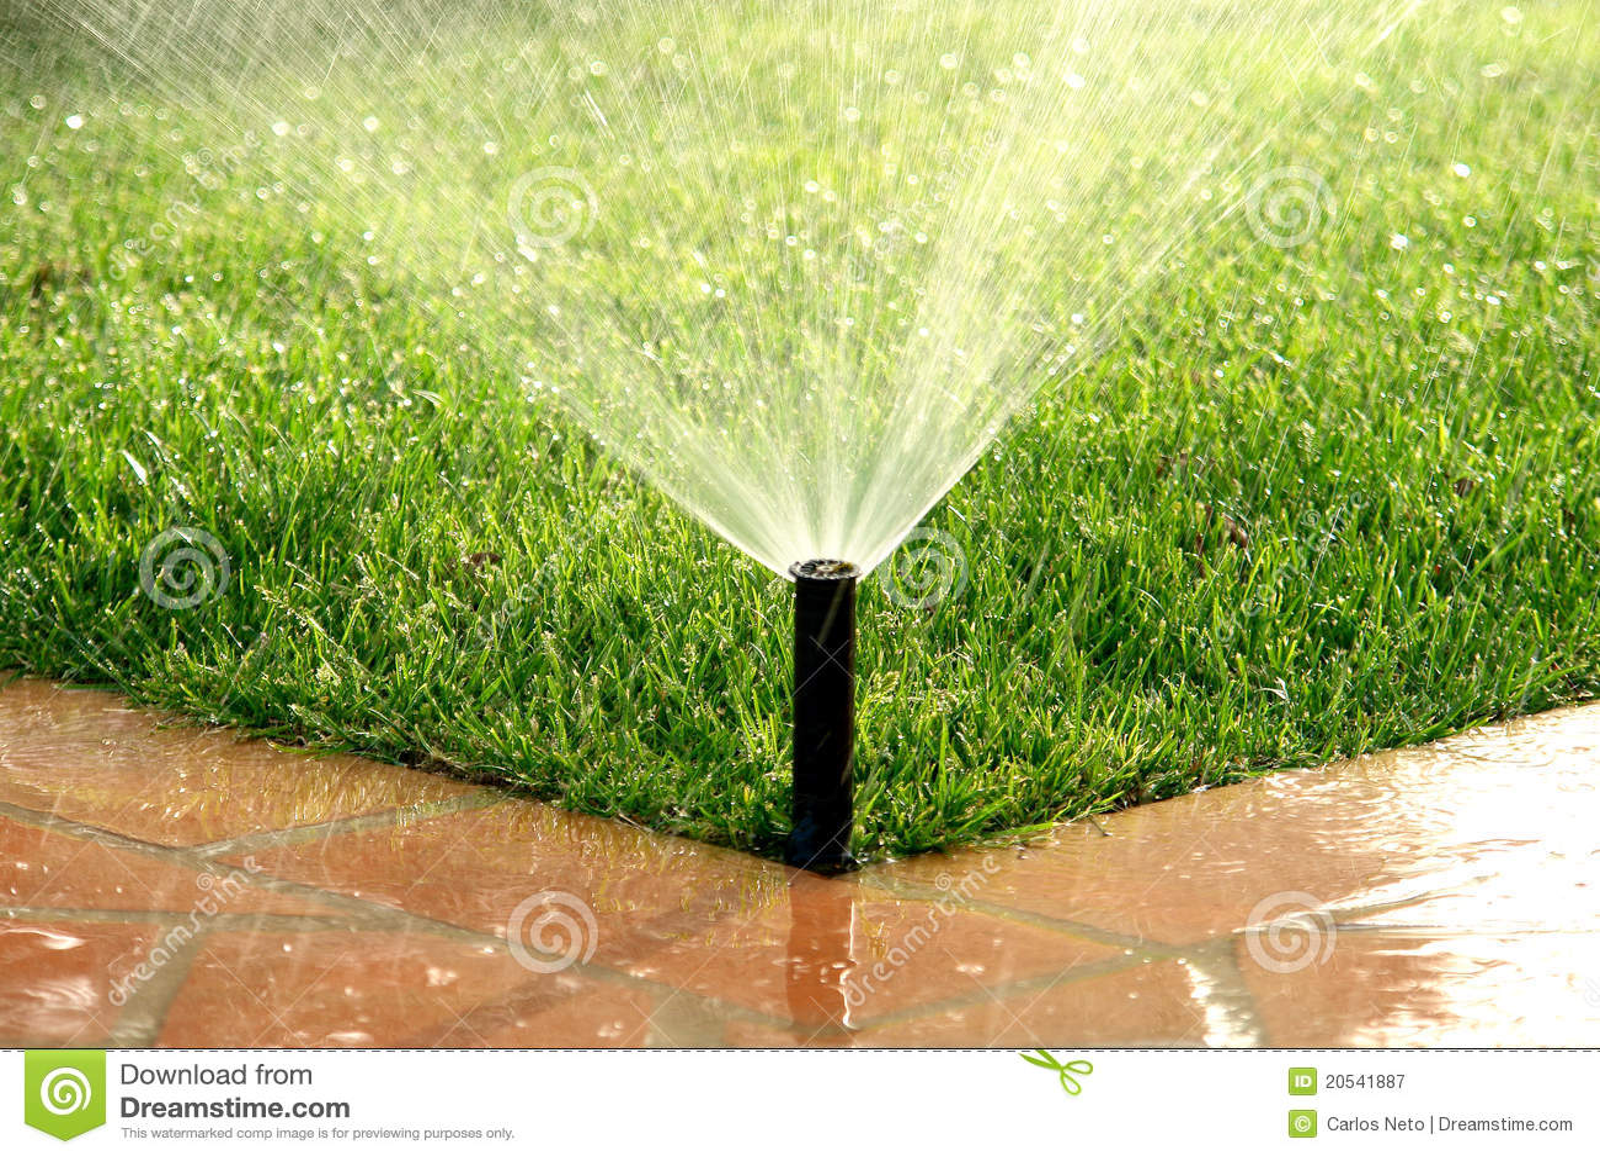 C sped de riego autom tico del sistema de irrigaci n del - Riego automatico cesped ...